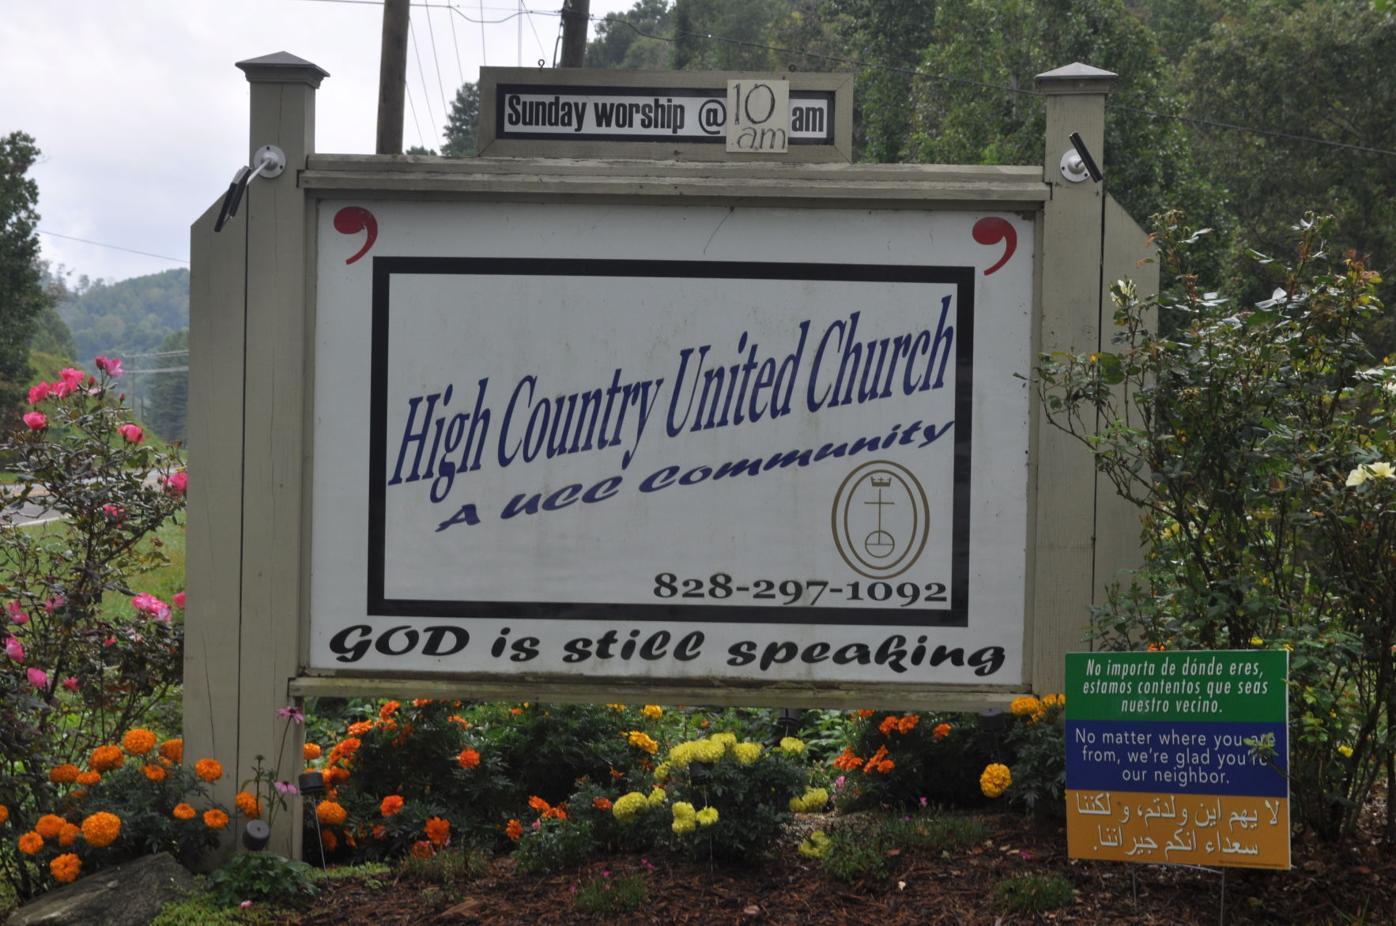 High Country United Church